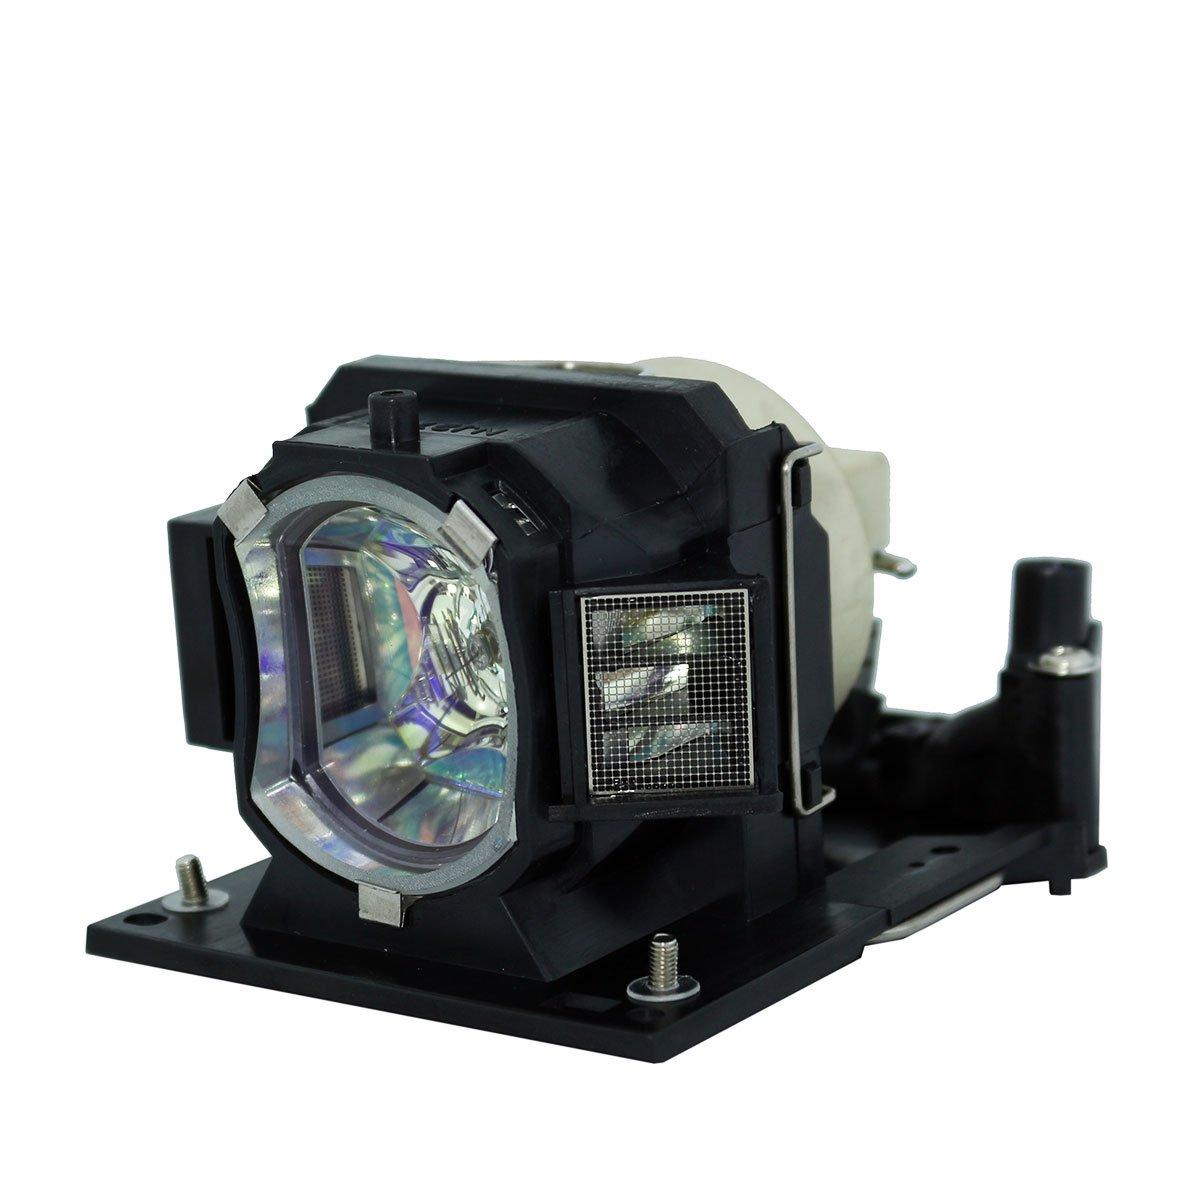 SpArc プロジェクター交換用ランプ 筐体/電球付き 日立CP-AW3019WNM Platinum (Brighter/Durable) Platinum (Brighter/Durable) Lamp with Housing B07MPVGJPP